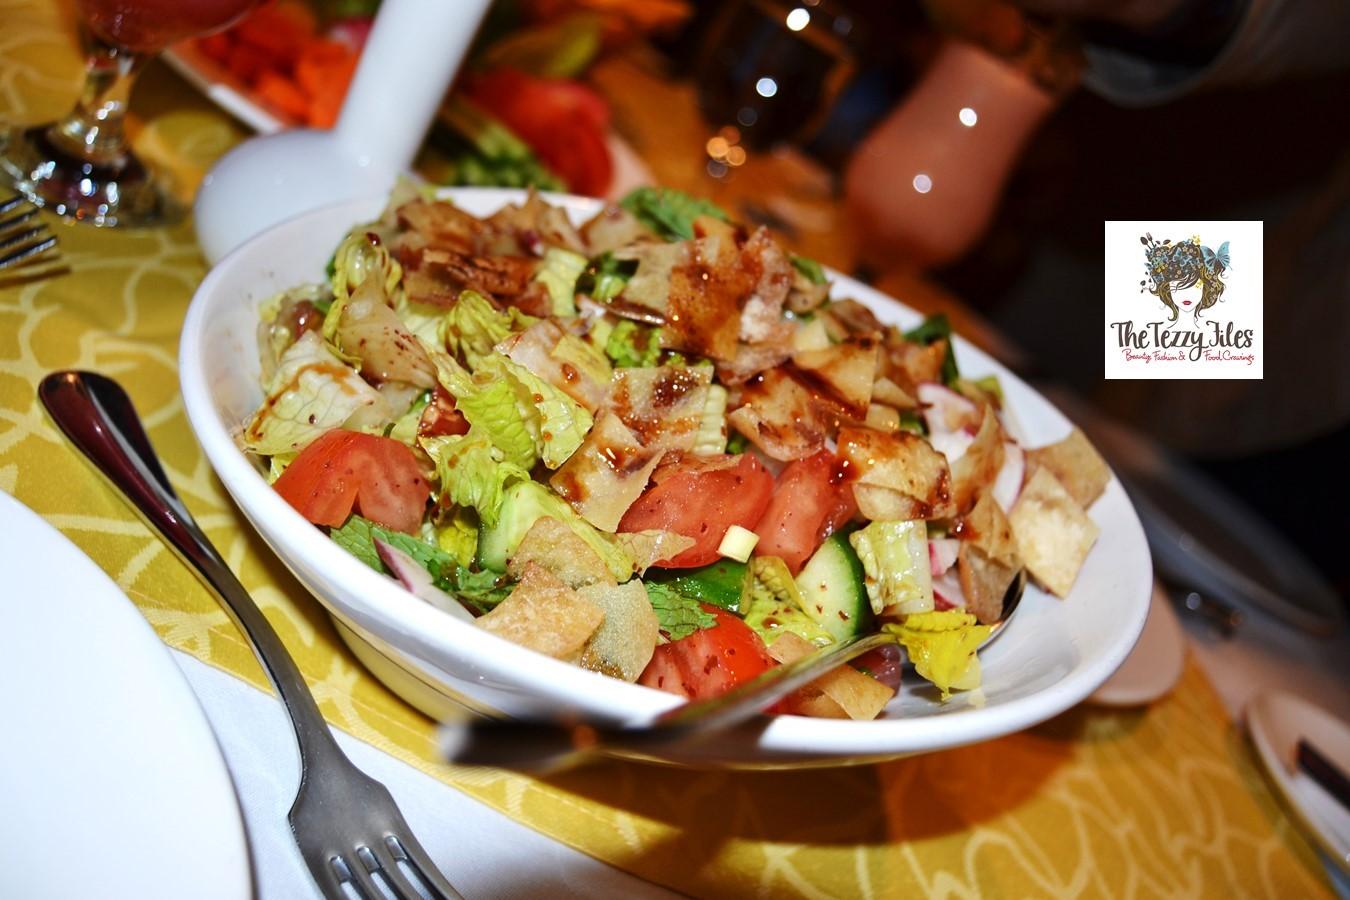 Tal al amar lebanese restaurant dubai review arabic for Al amar lebanese cuisine